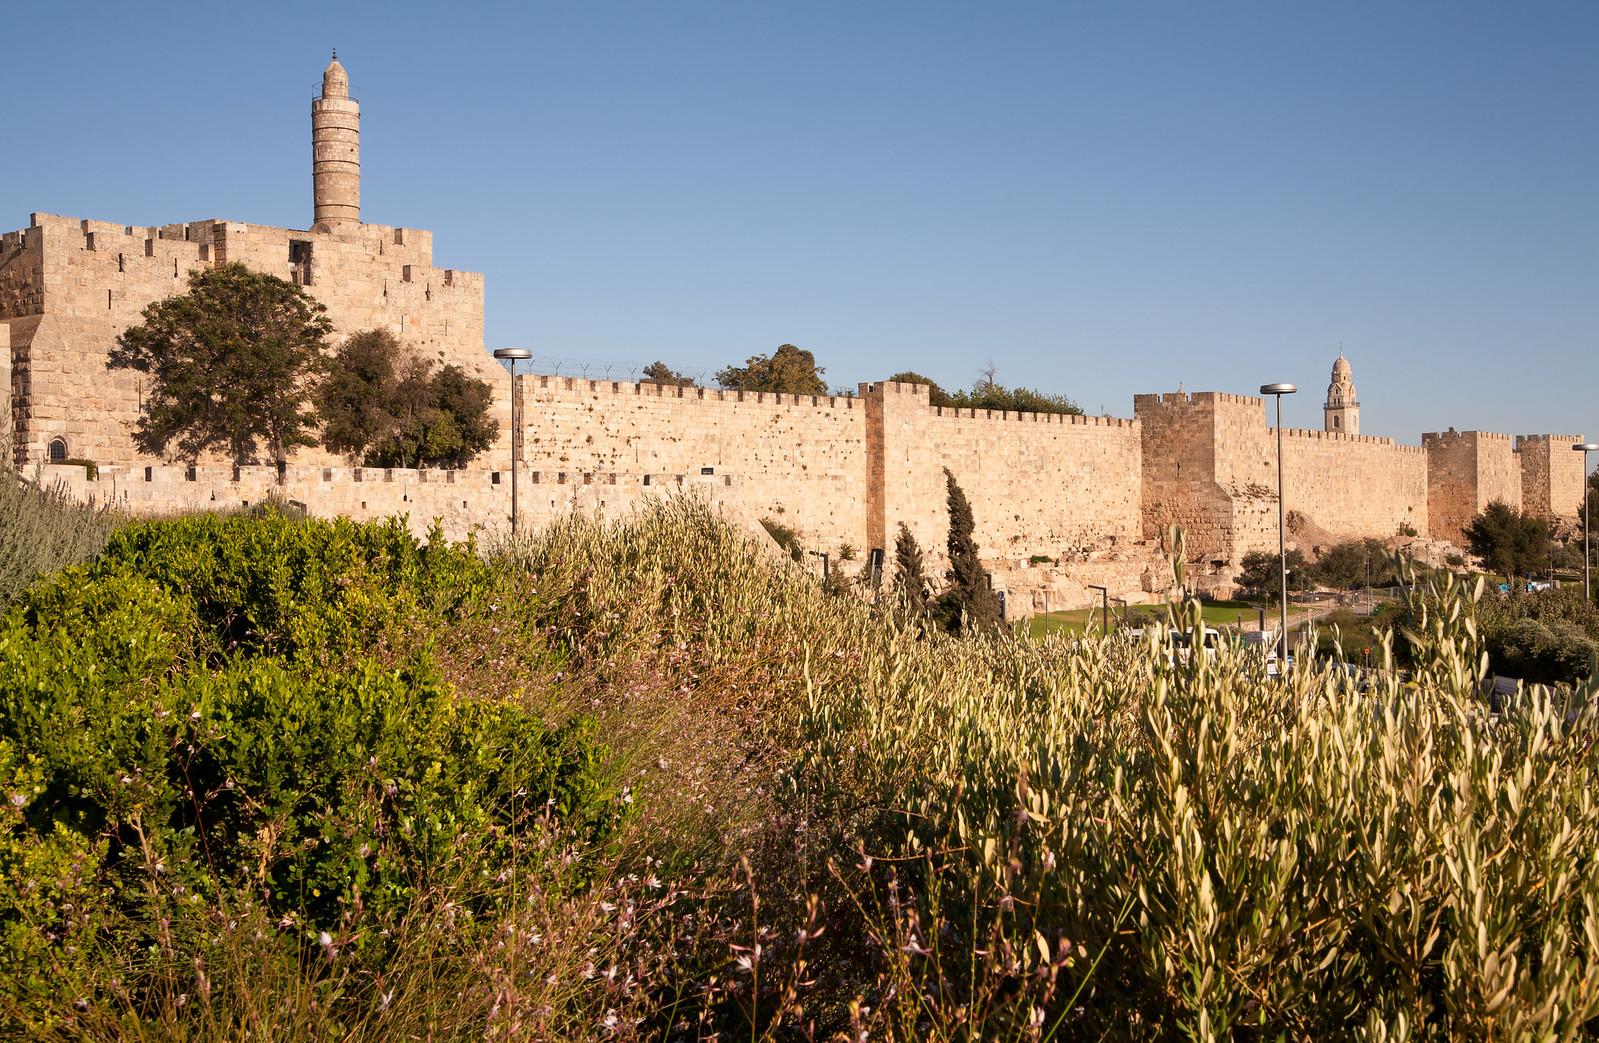 Jerusalem_The Tower of David_1_Noam Chen_IMOT